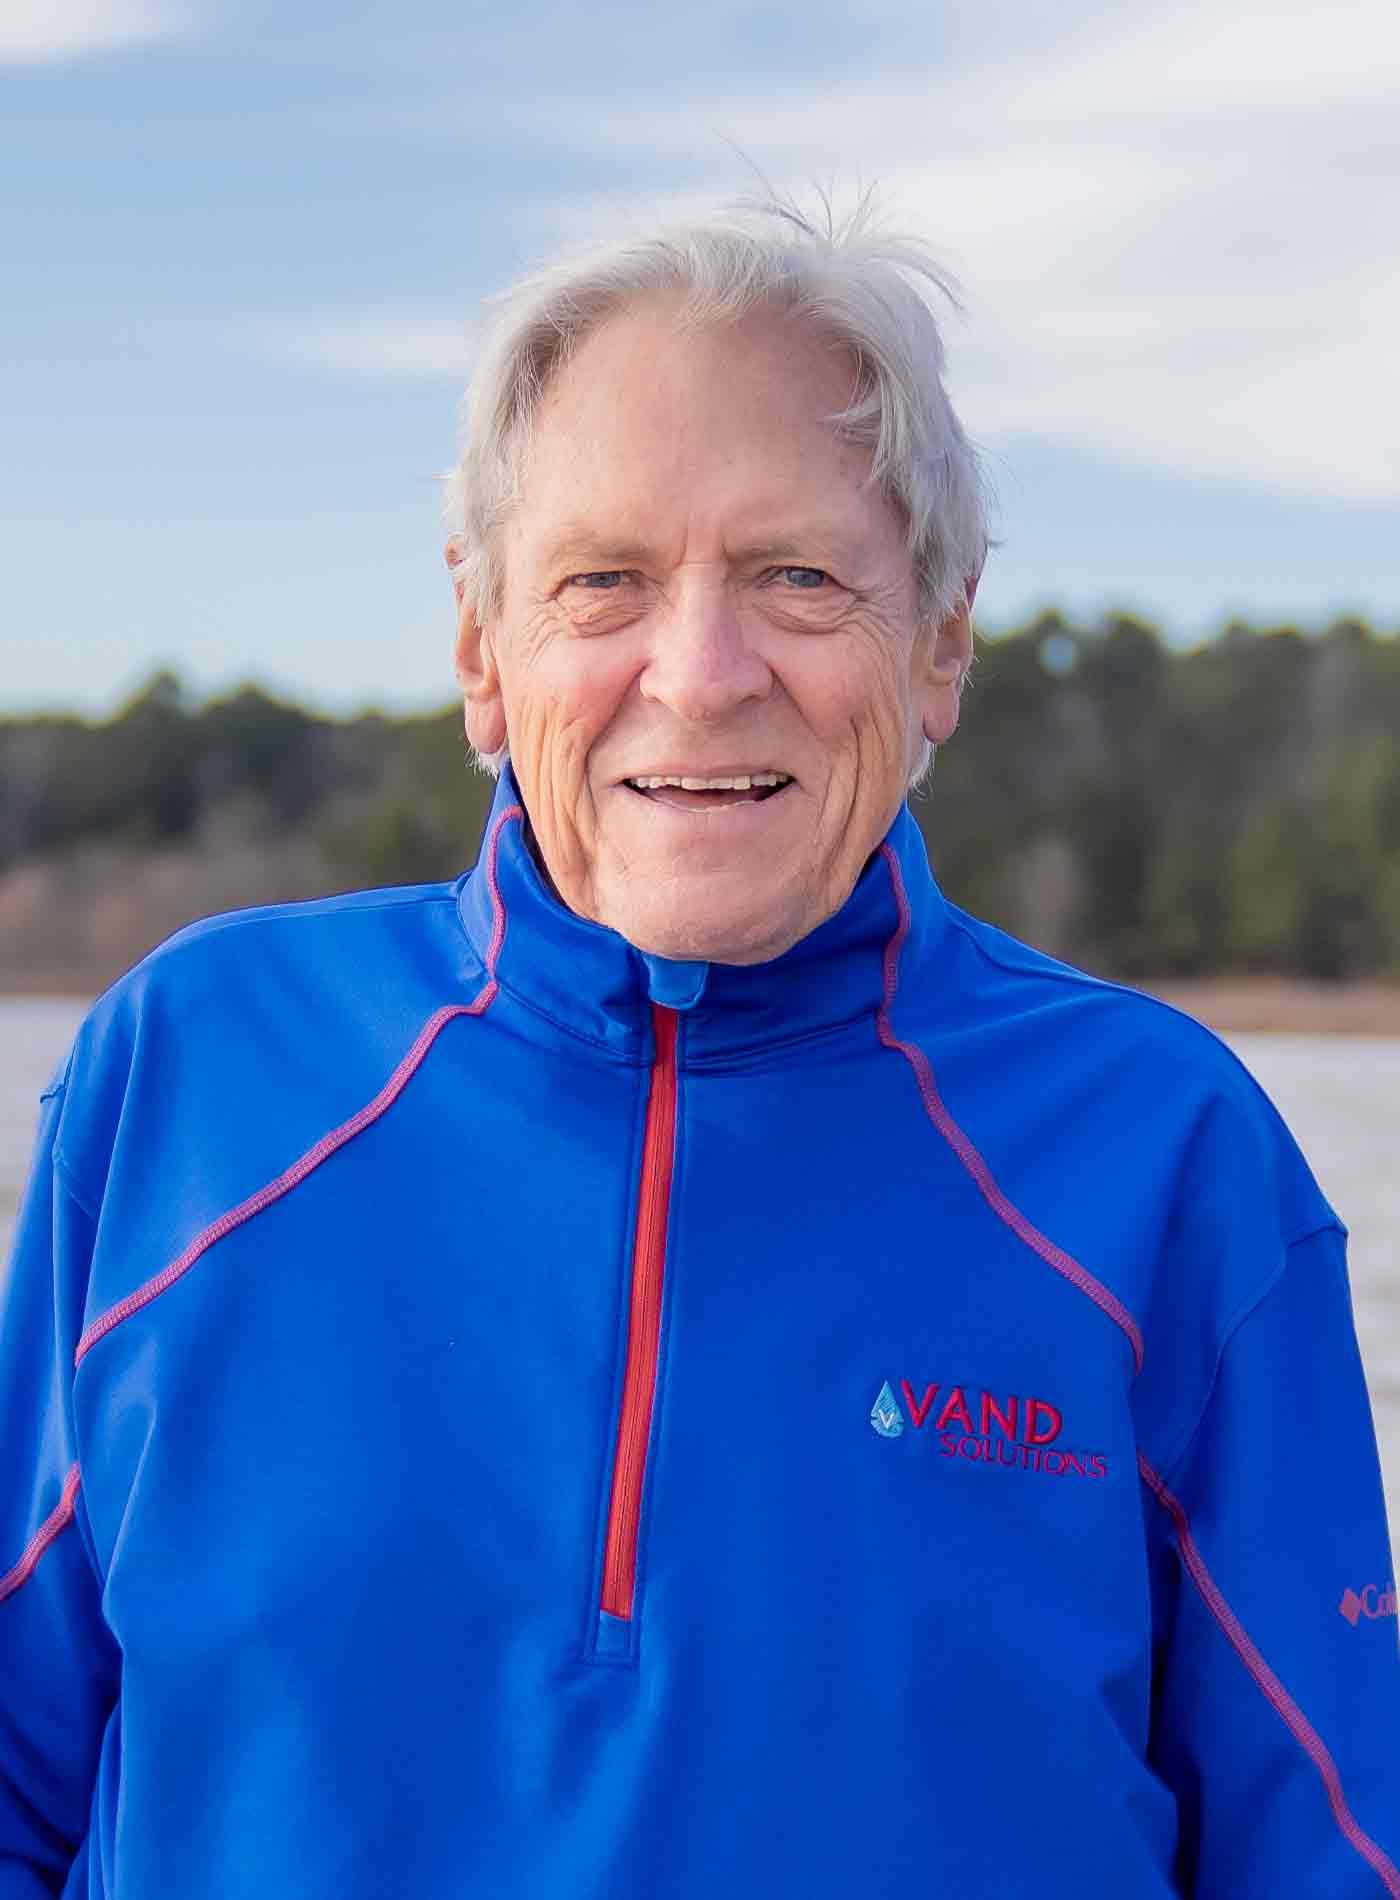 Finn Nielsen is the founding partner behind Vand Solutions.